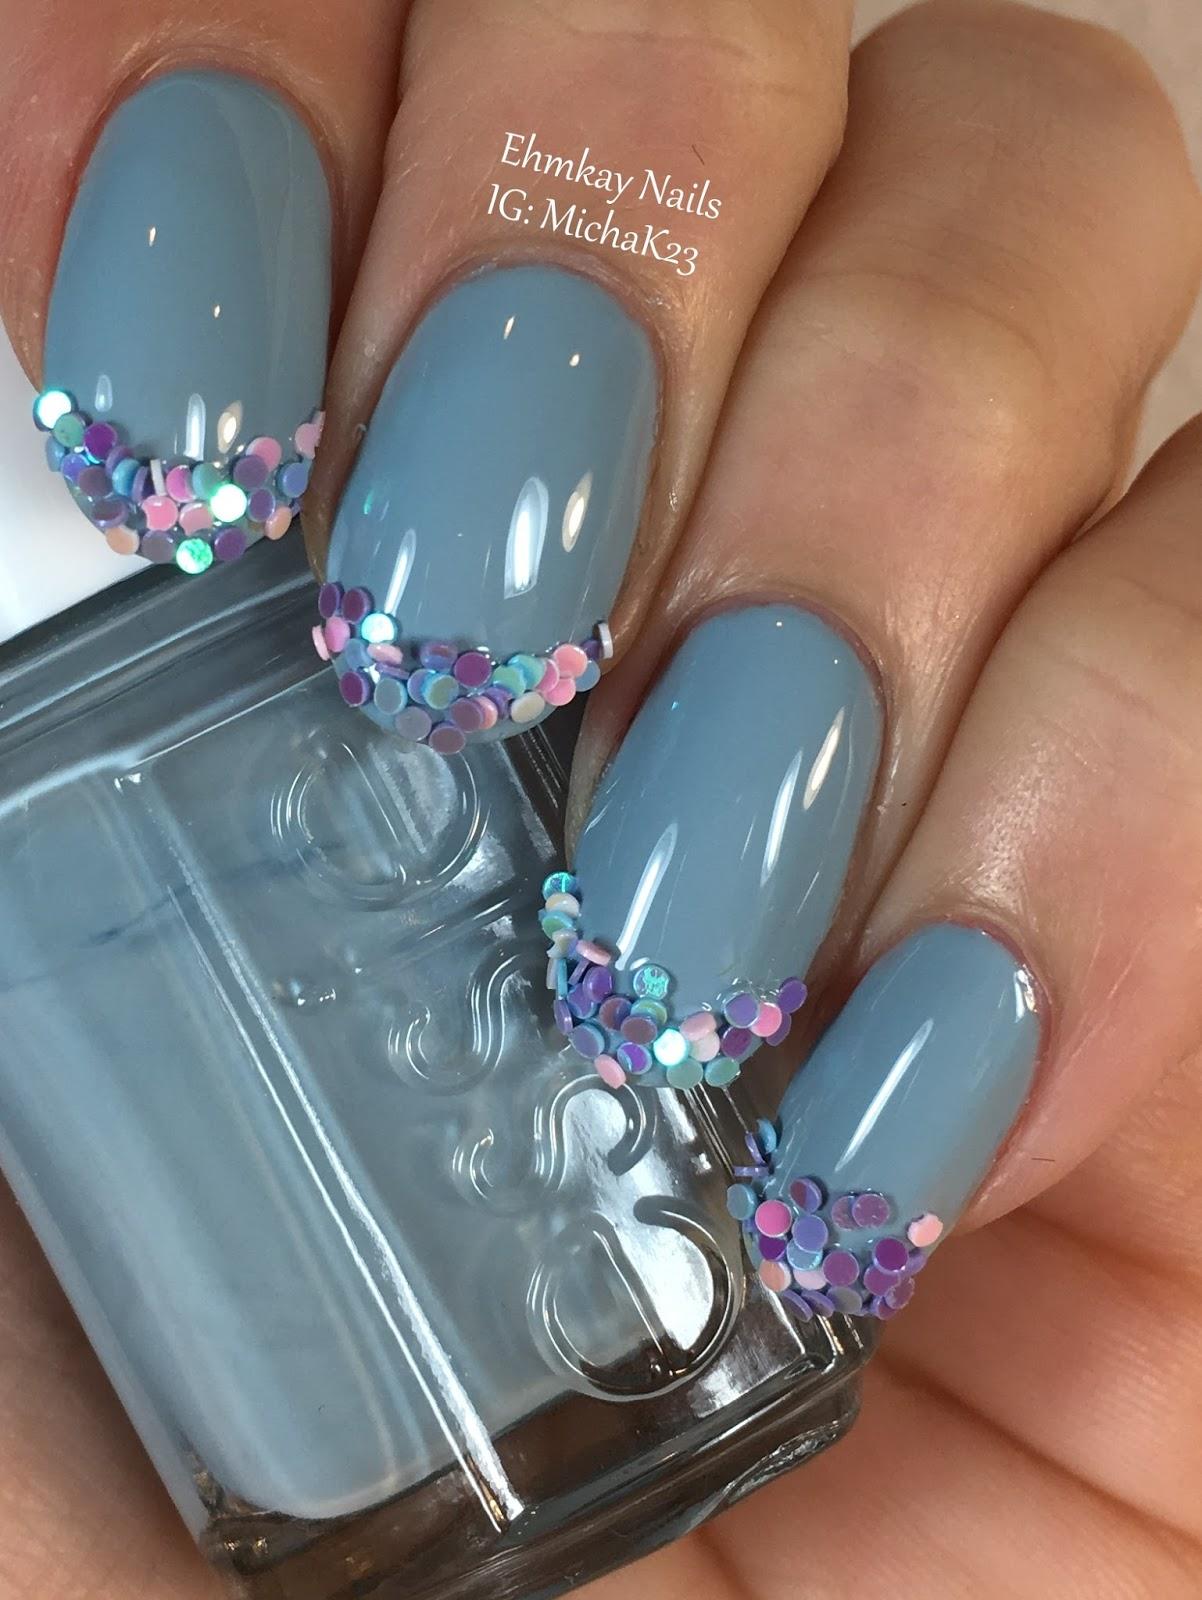 Ehmkay nails sprinkles nail art with lady queen nail gems sprinkles nail art with lady queen nail gems prinsesfo Gallery